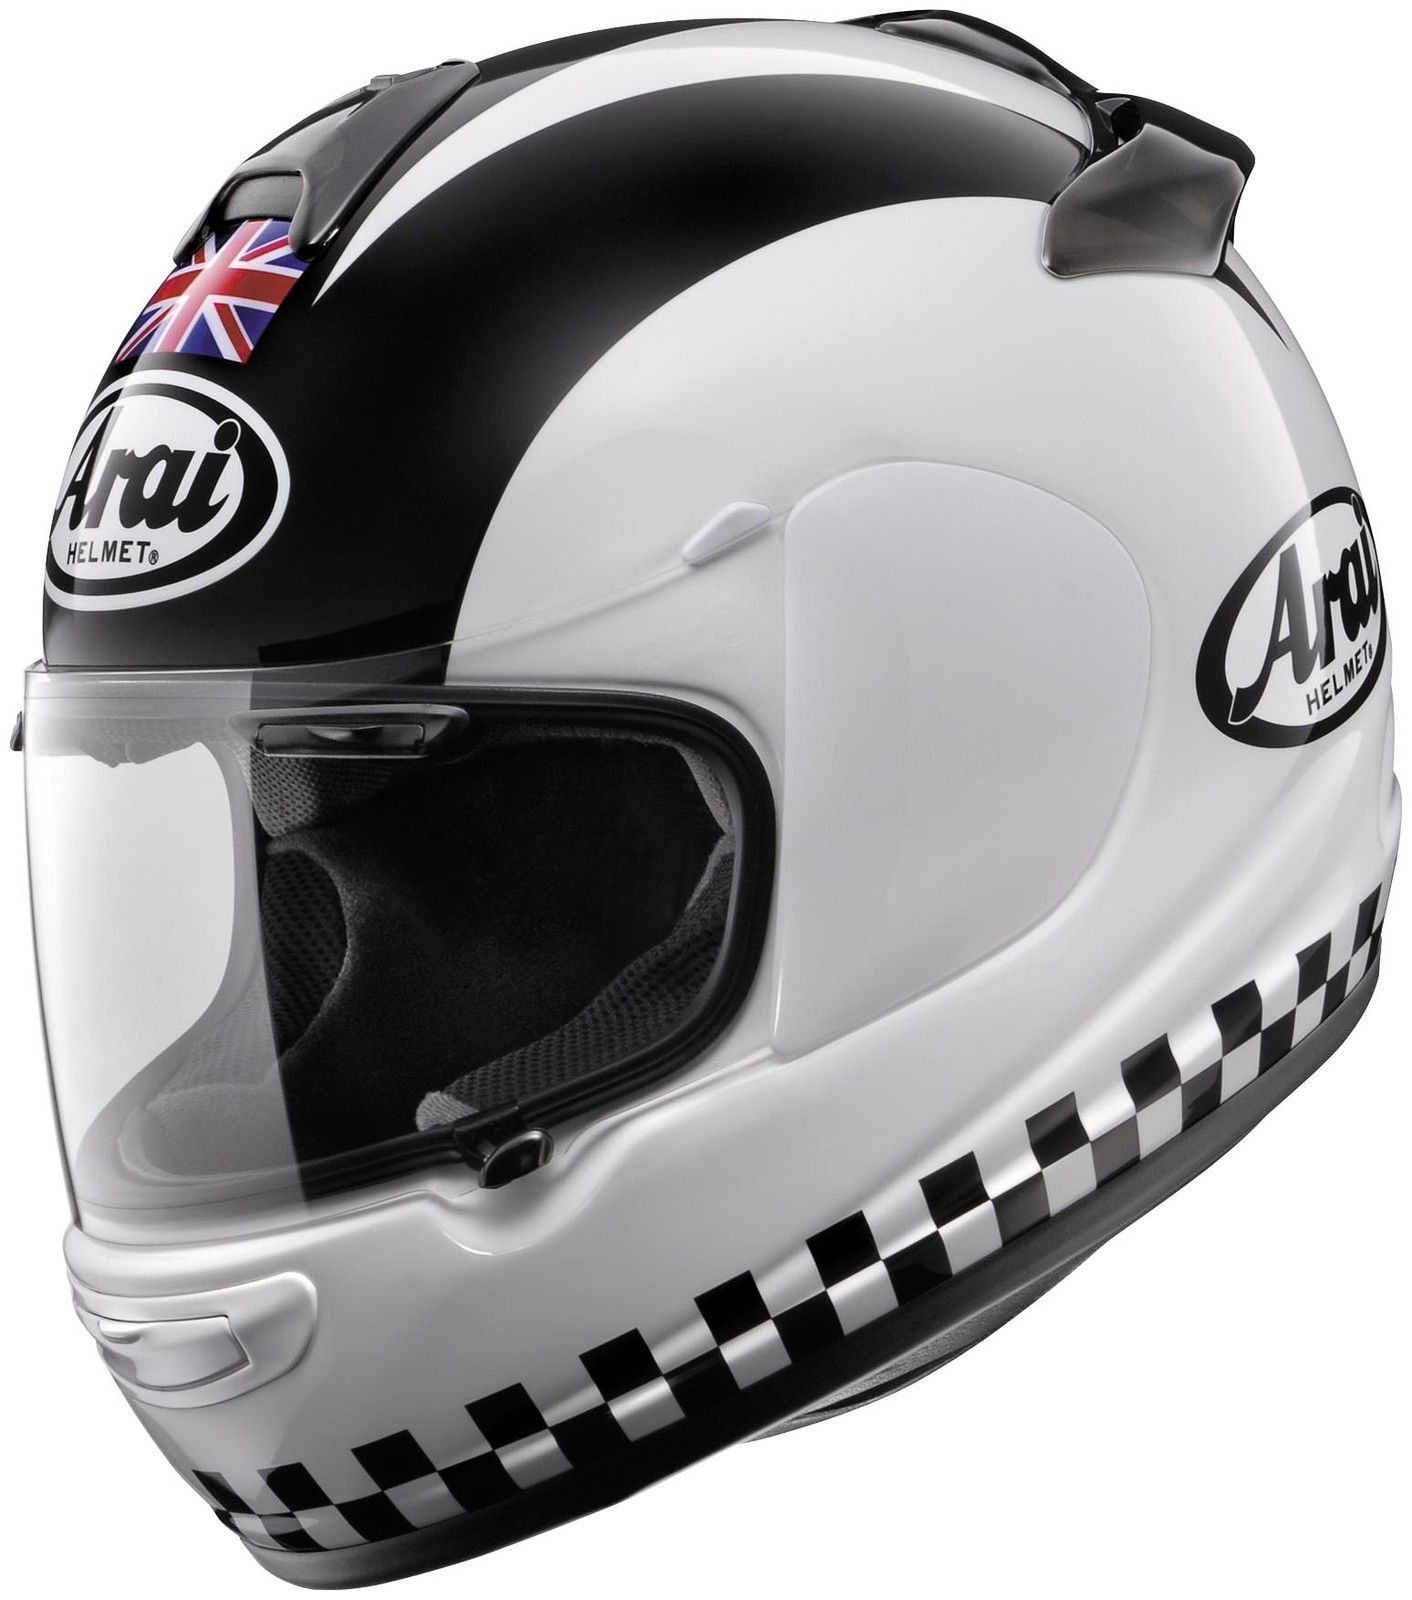 Arai Phil Read Helmet Bikes & Stuff White Motorcycle